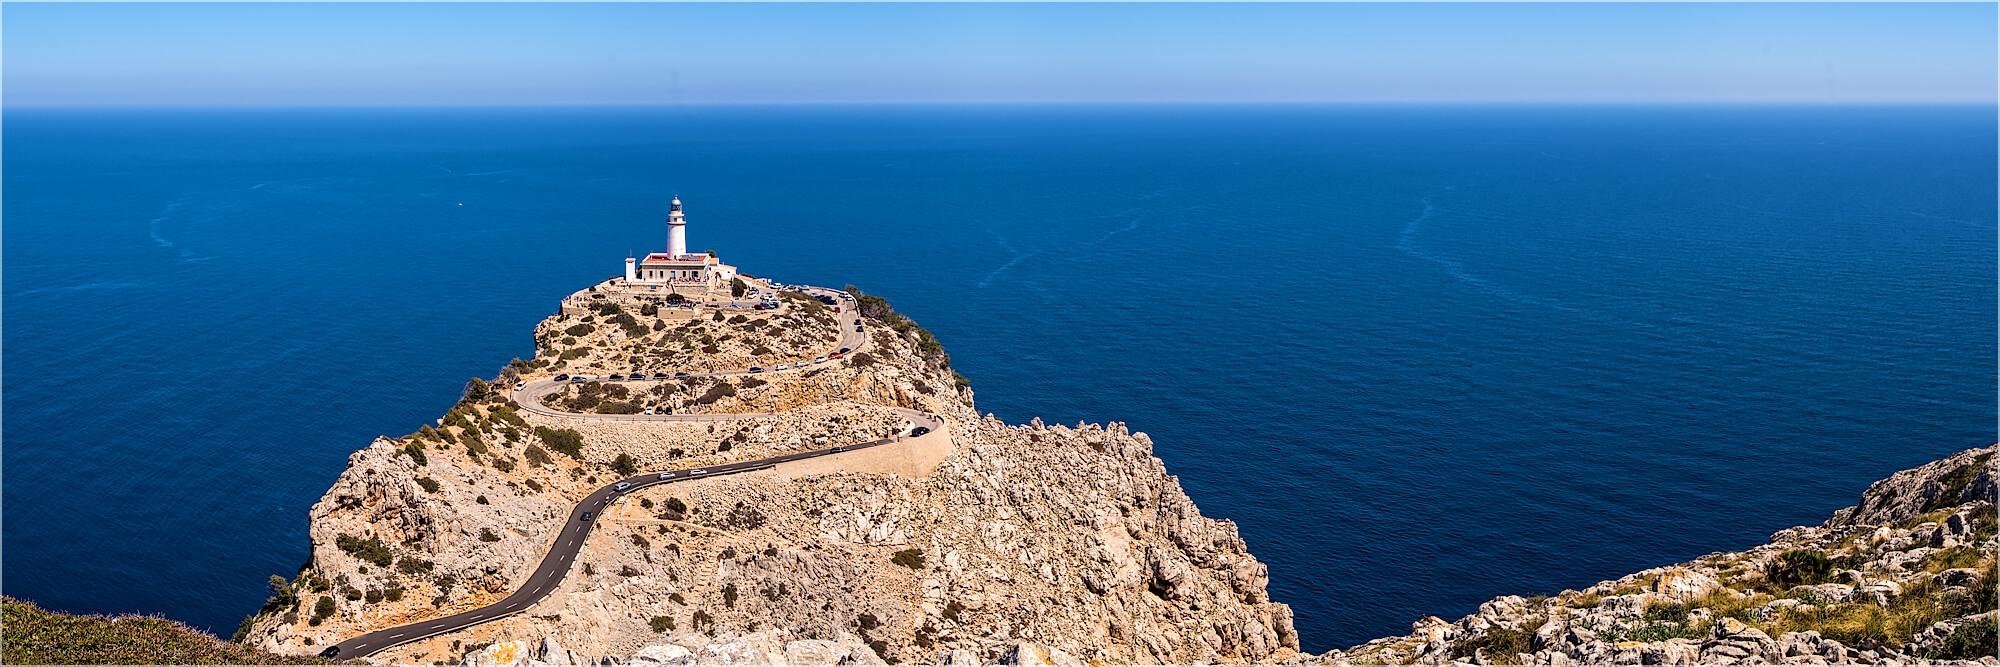 Panoramabild Leuchtturm von Cap Formentor Mallorca